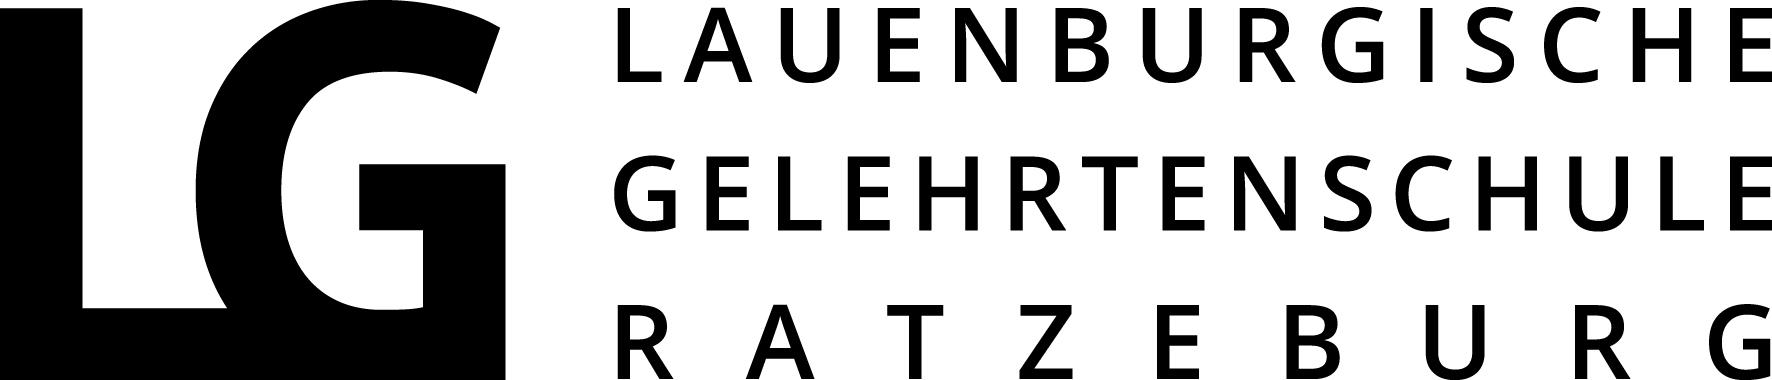 LG Ratzeburg